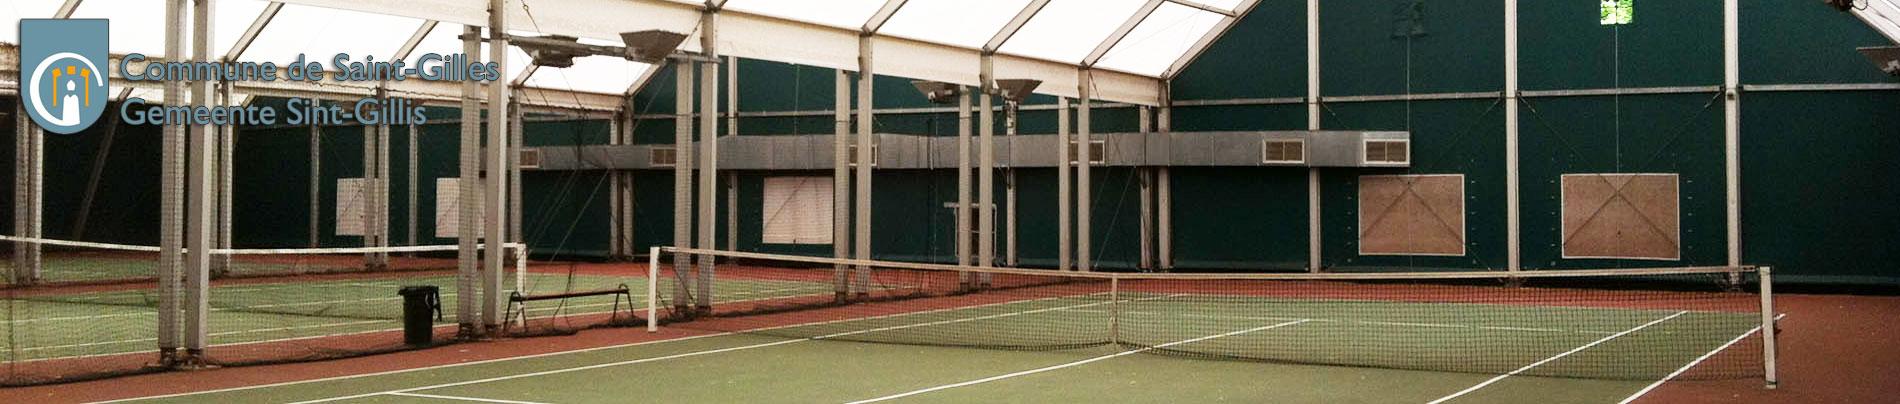 Tennis hiver